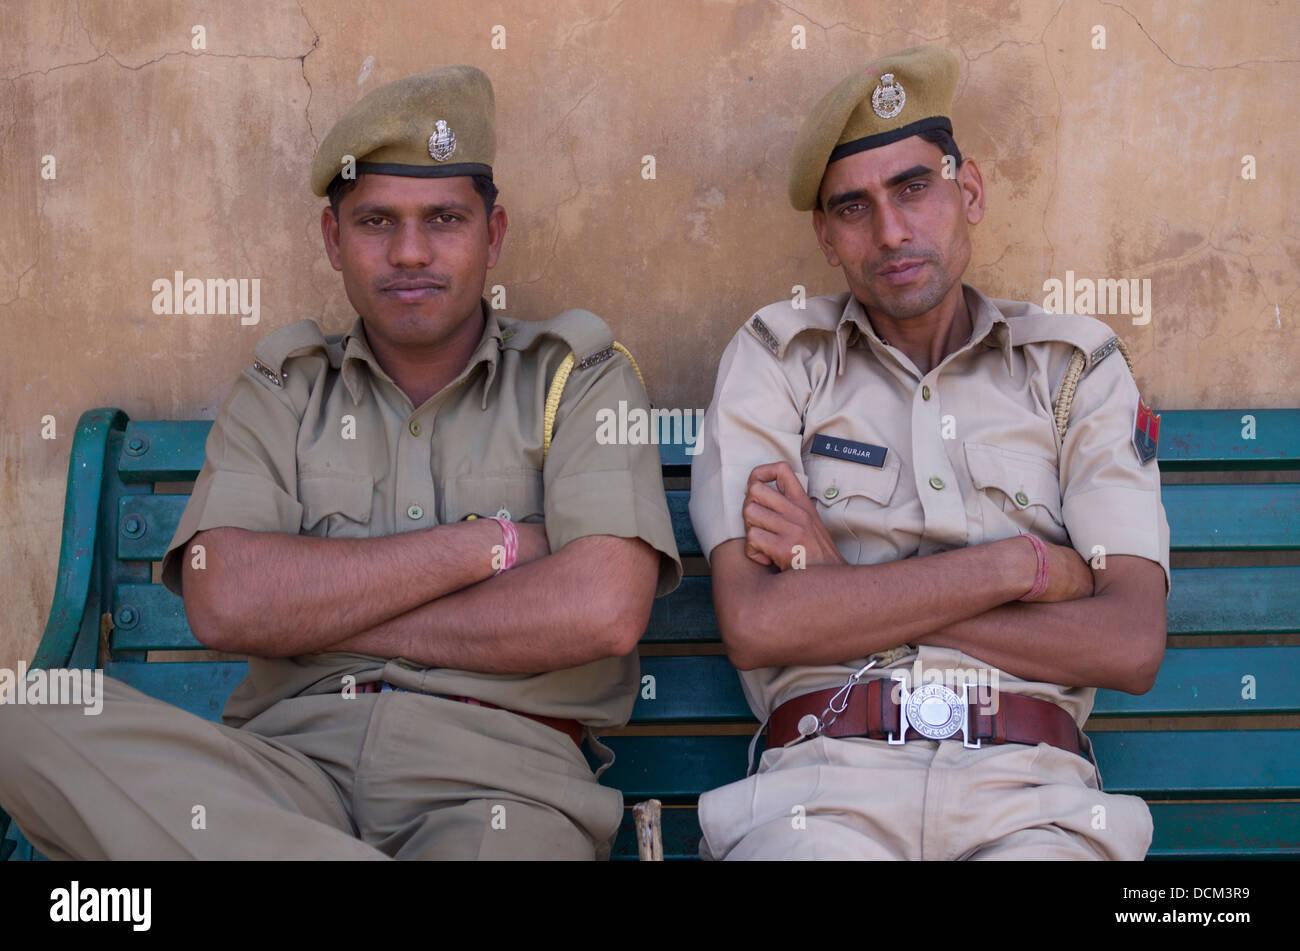 Los guardias de seguridad de la India en color ámbar ( ) Amer Fort / Palace - Jaipur, Rajasthan, India Imagen De Stock